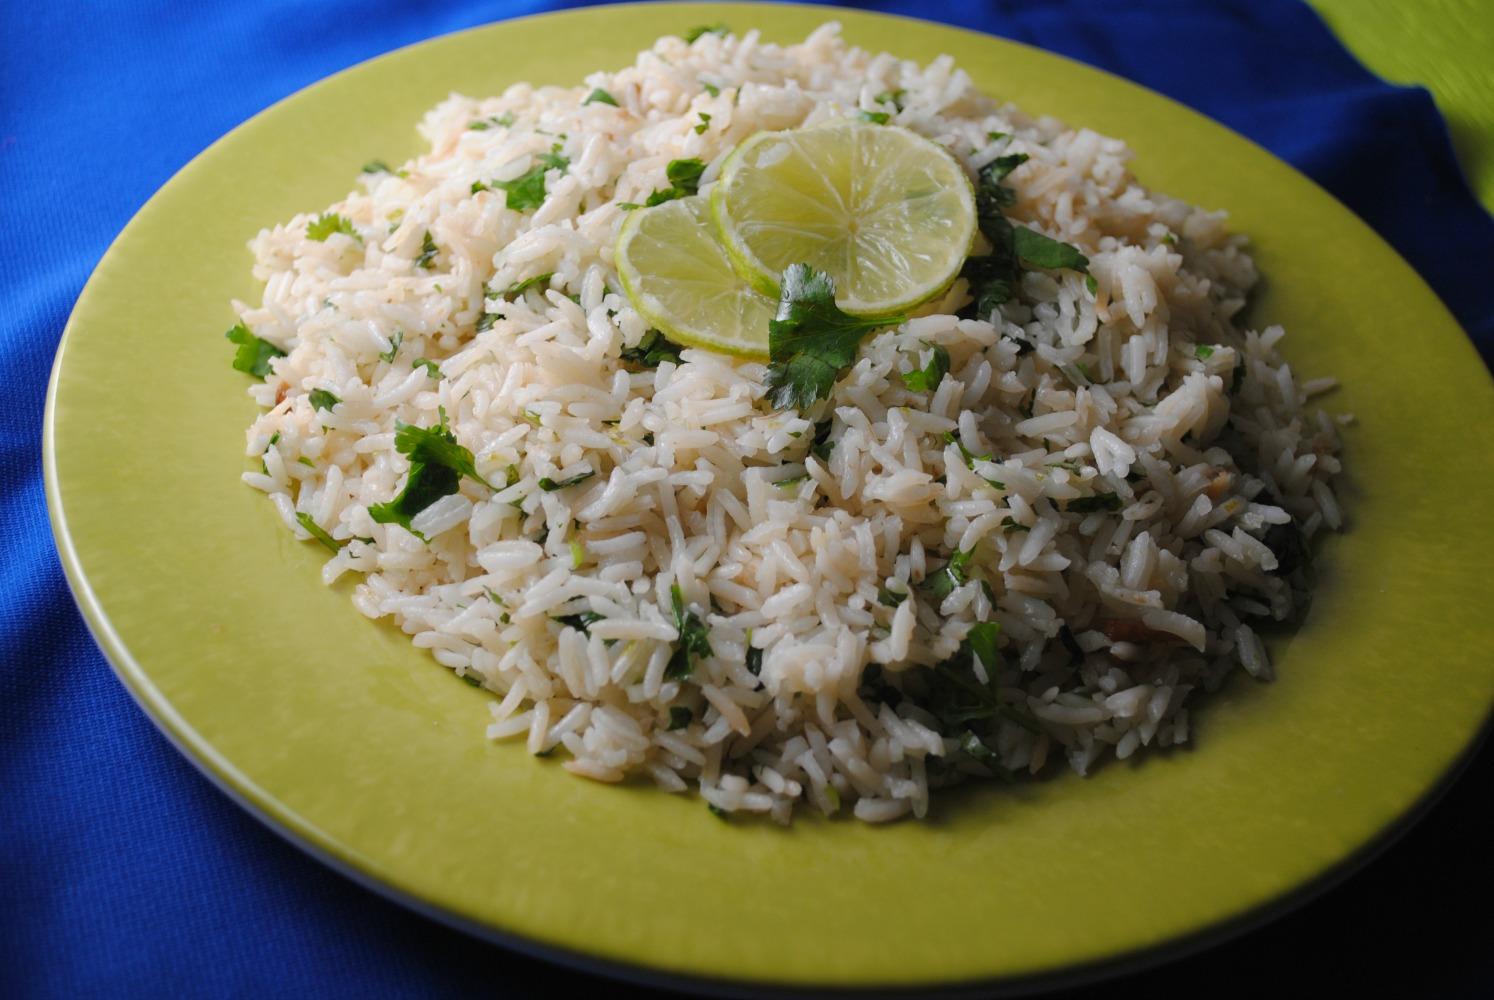 cilantro-lime-rice-VianneyRodriguez